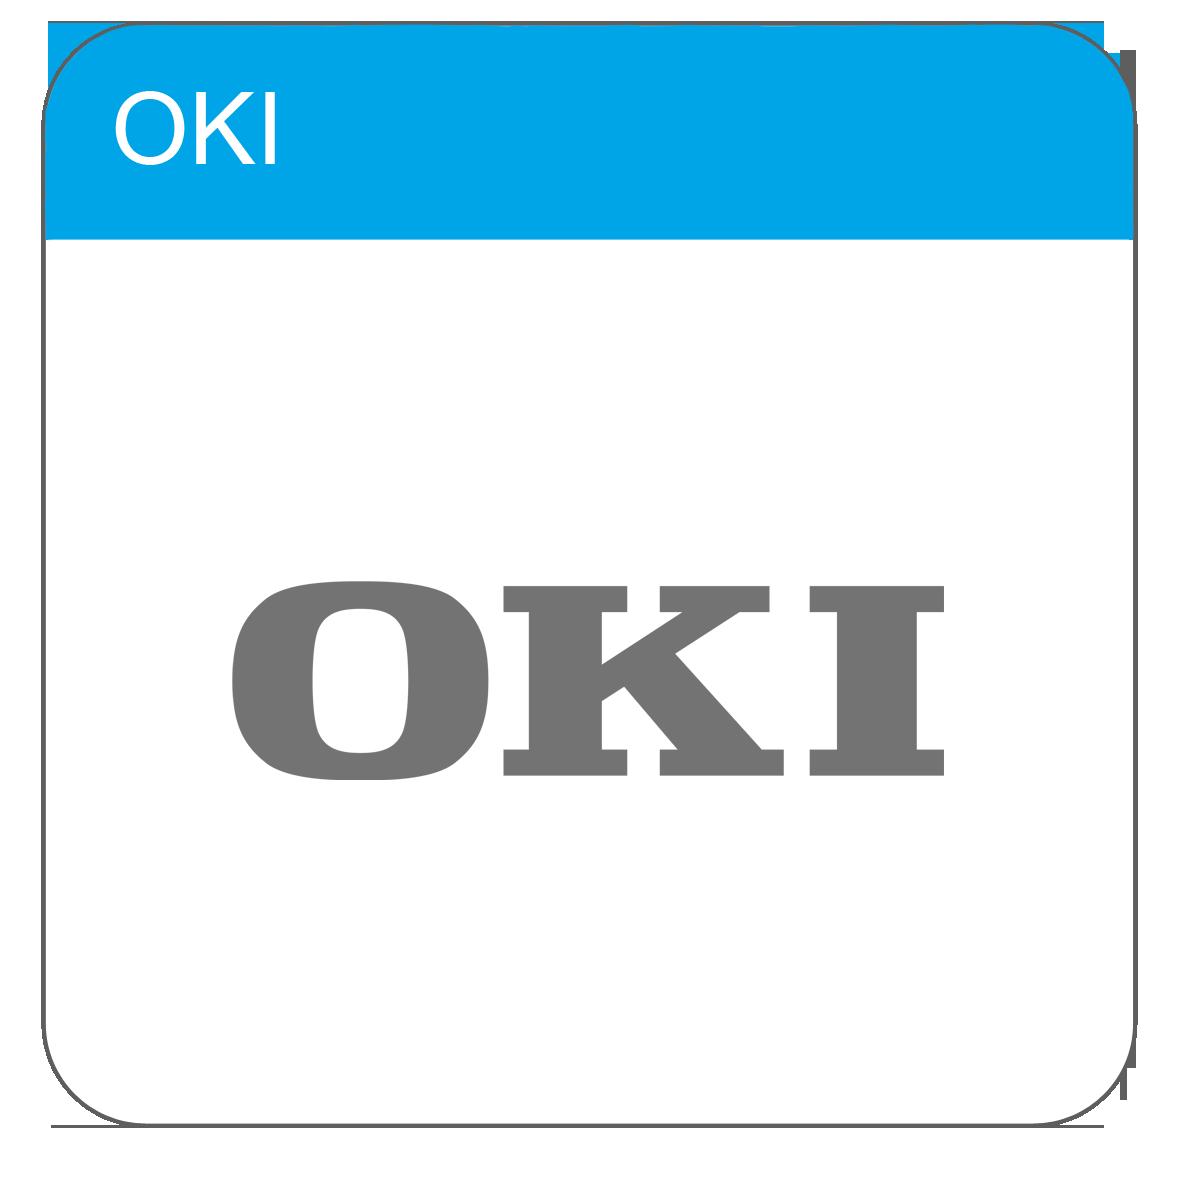 Oki Drivers & Handleidingen